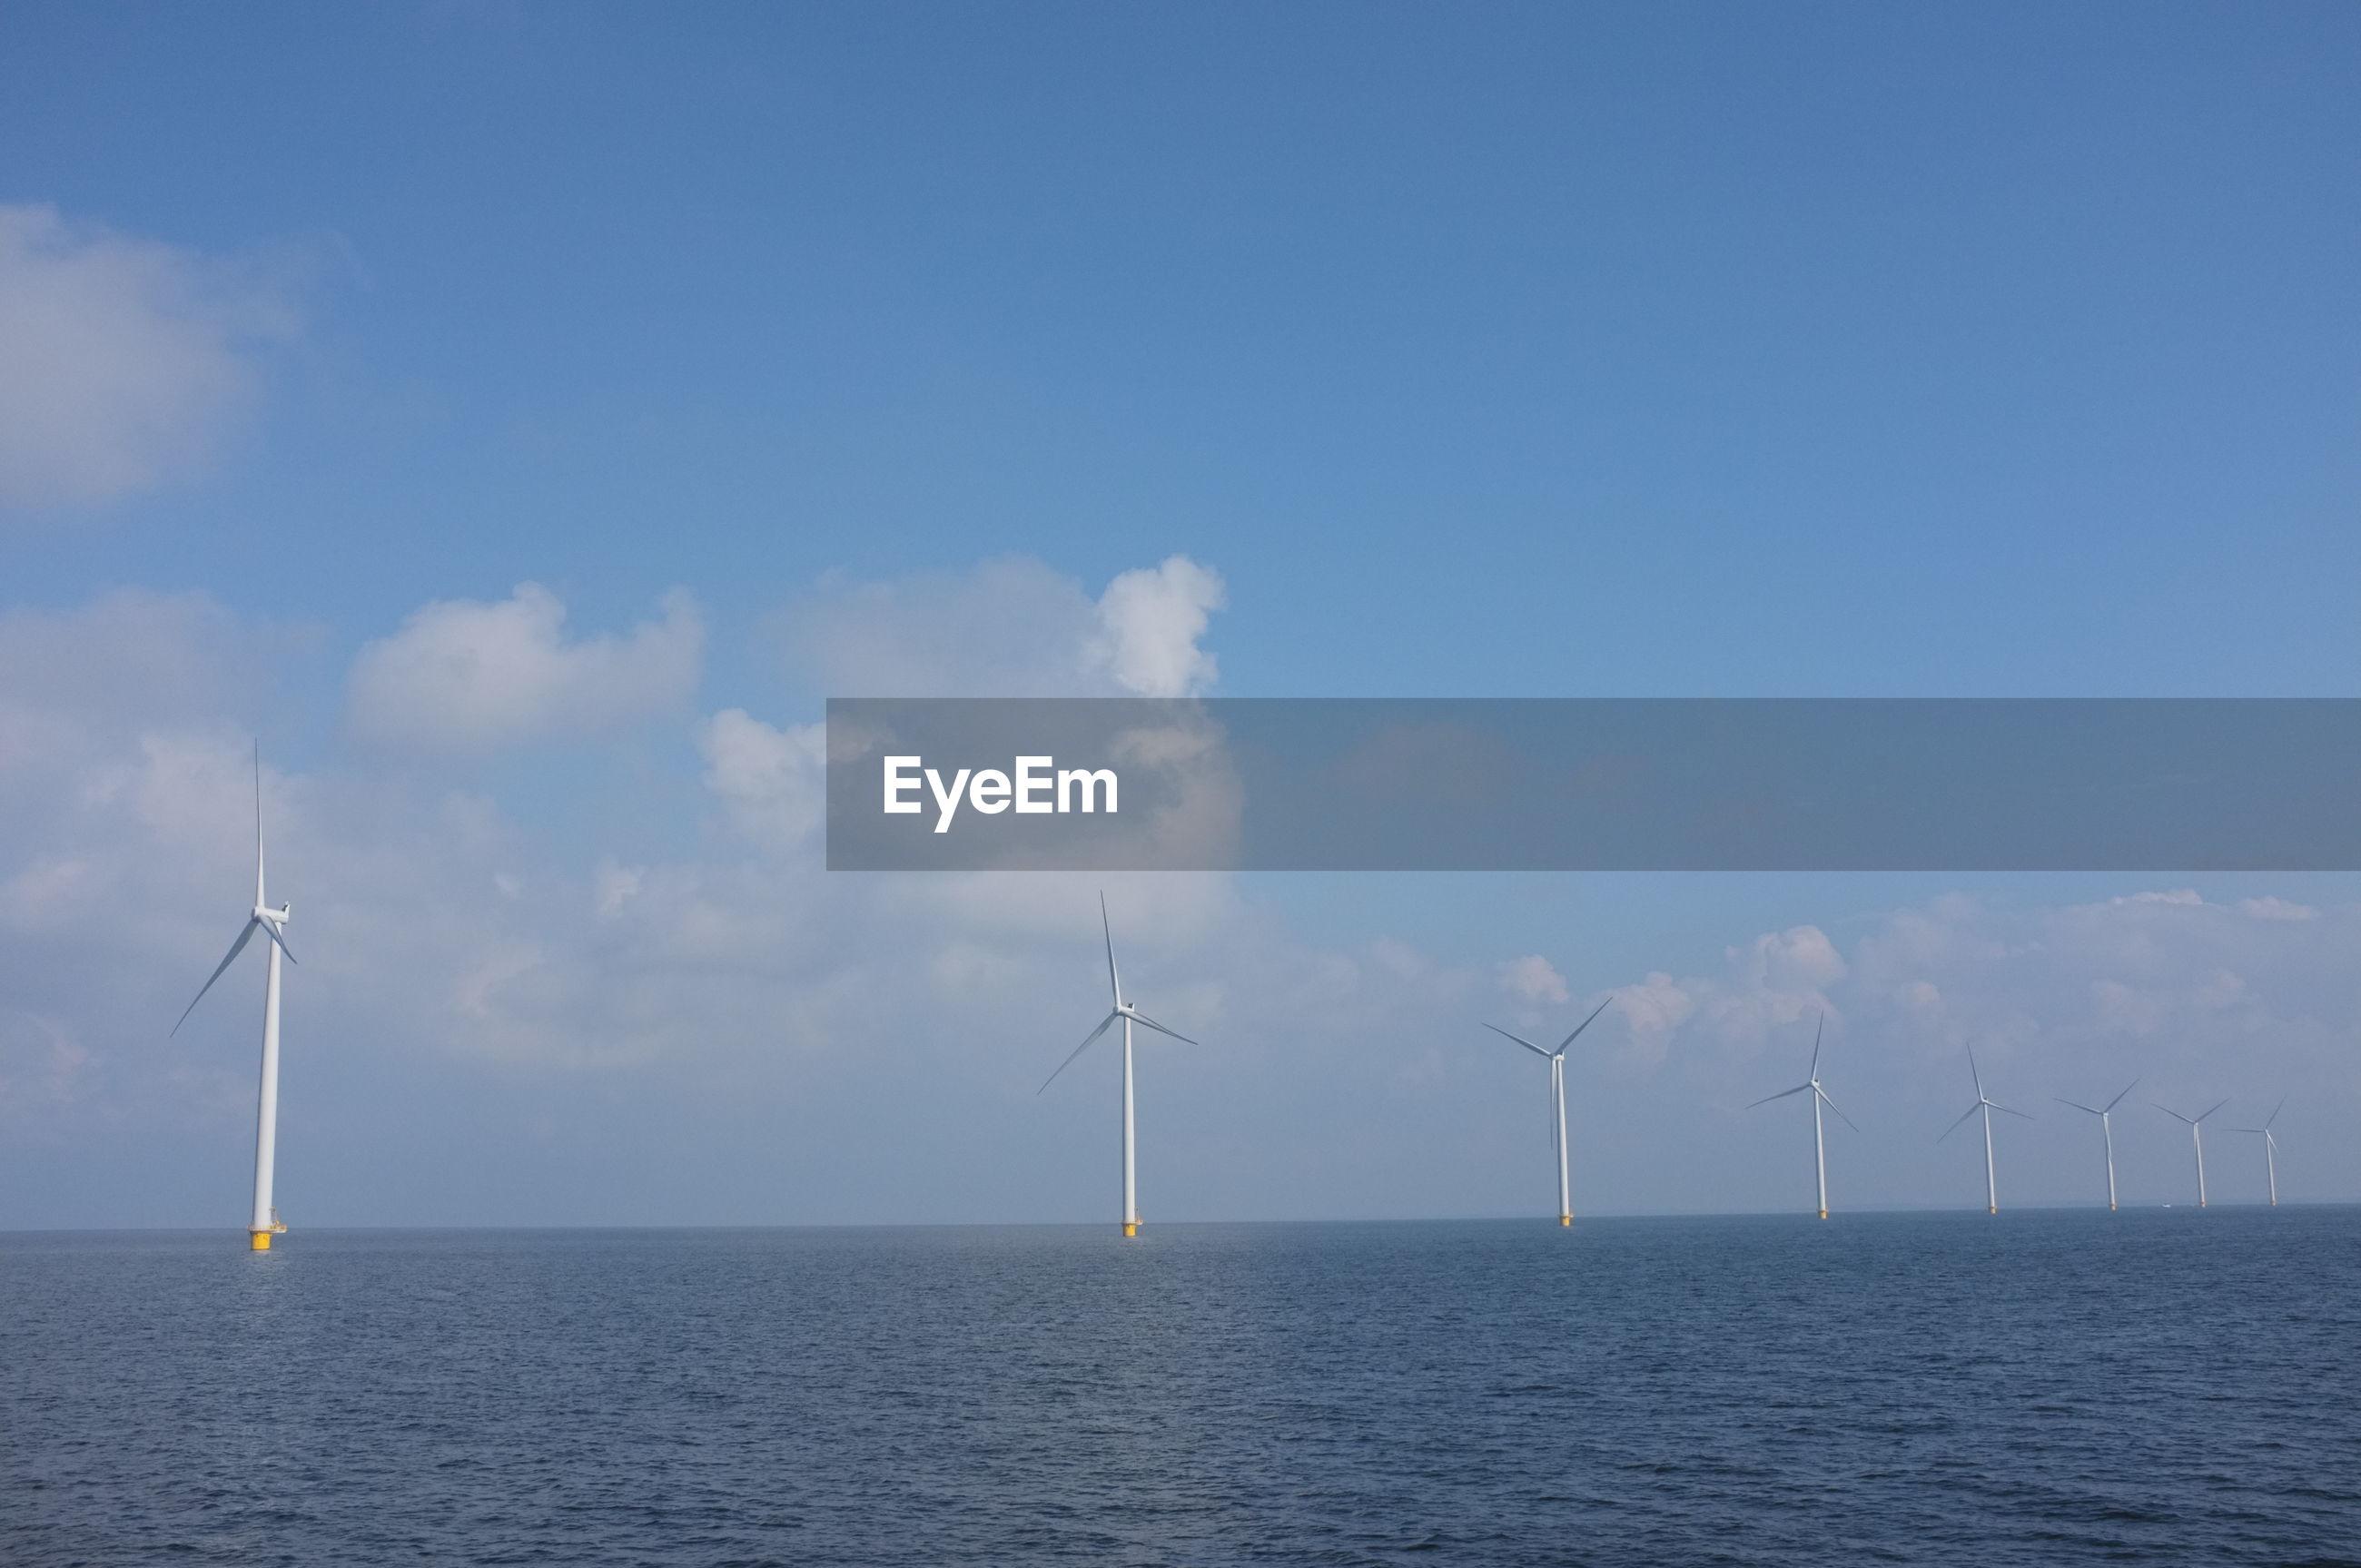 SCENIC VIEW OF THE SEA